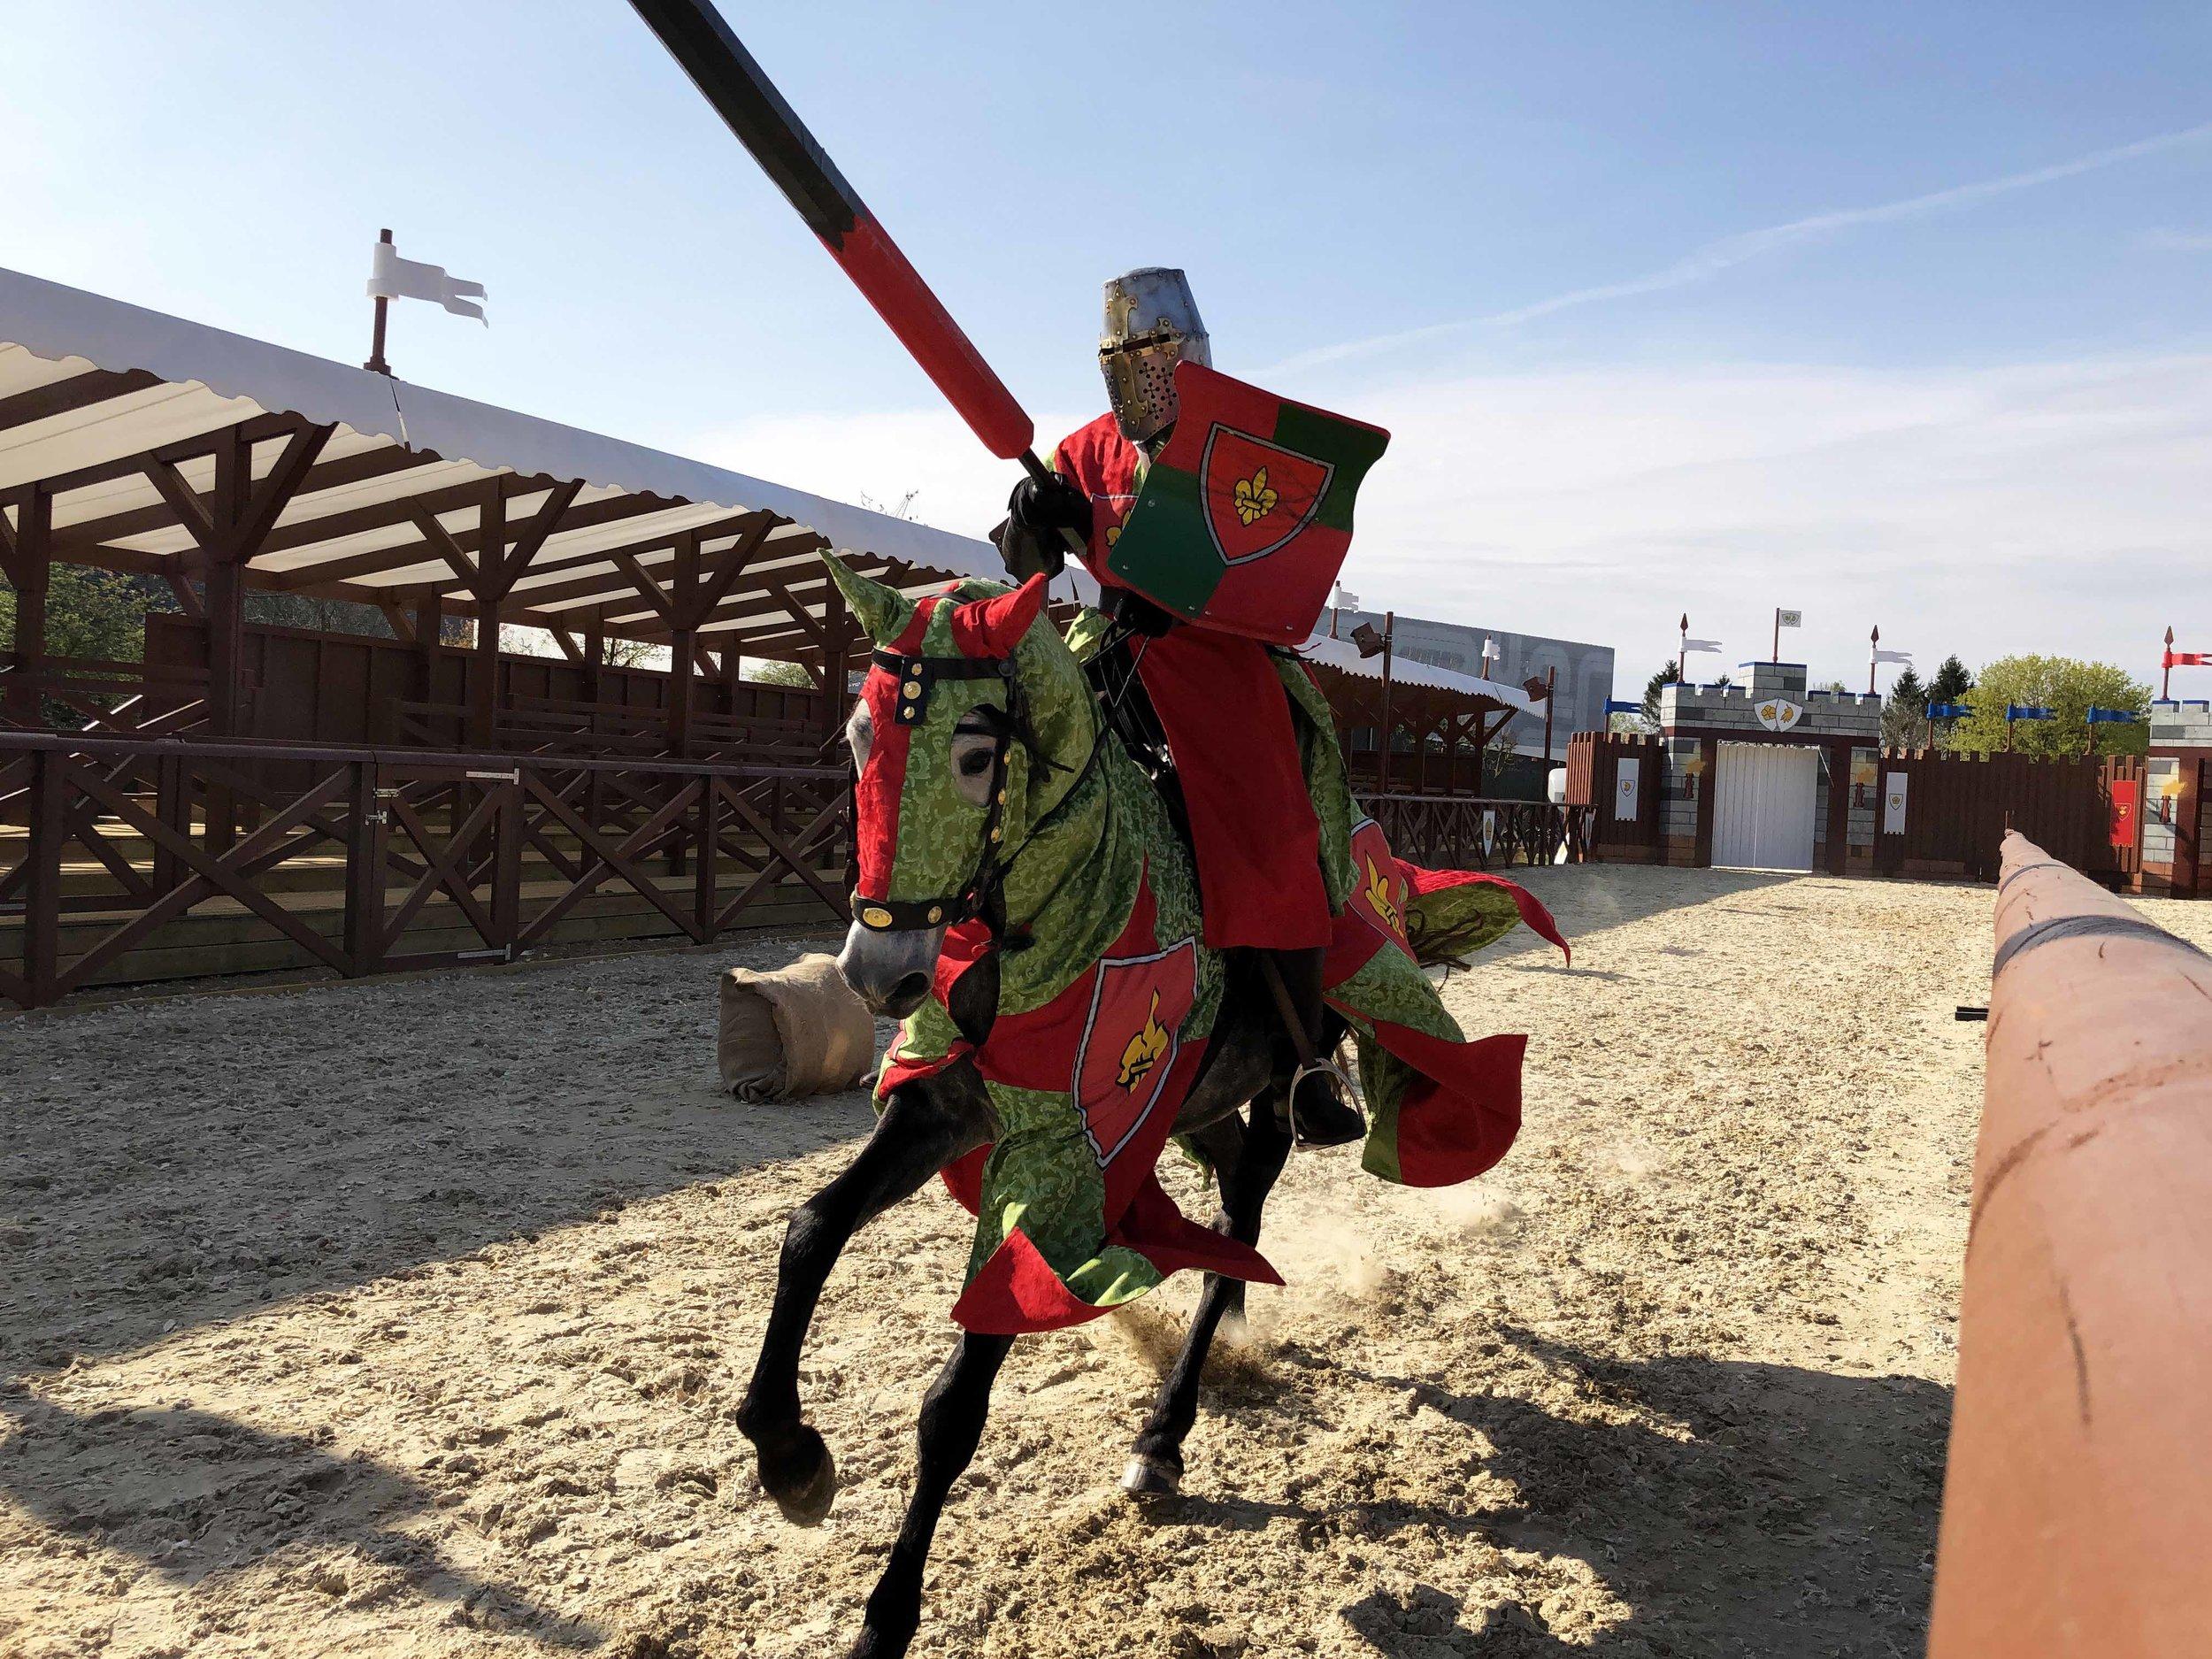 Sommerens ridderkamp i Legoland. Foto: Legoland